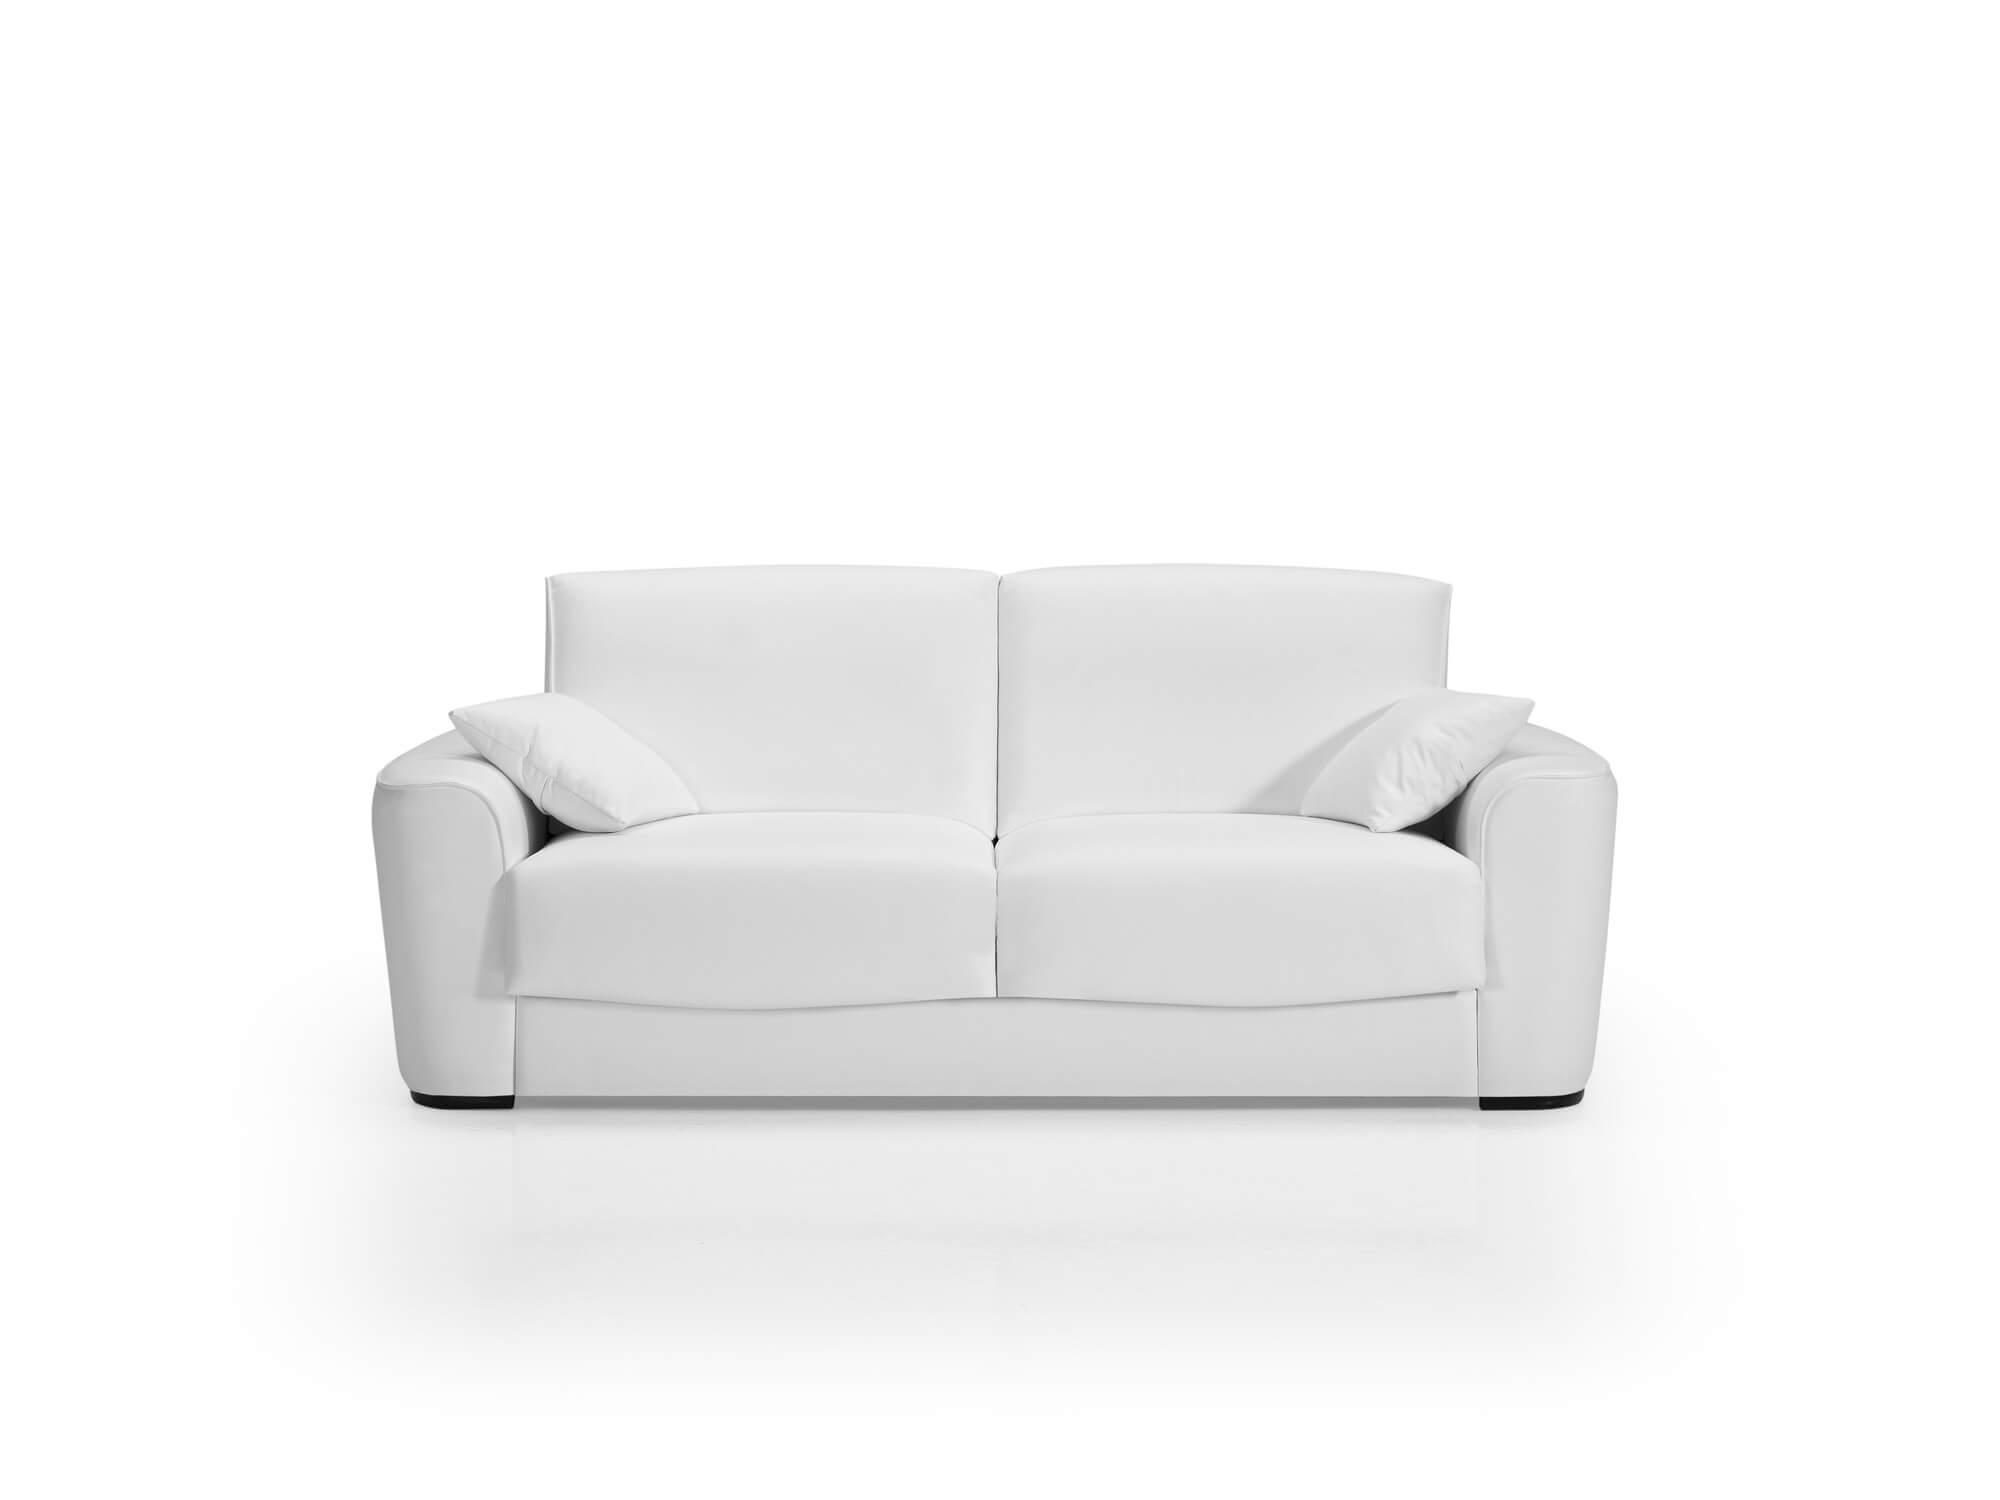 Comprar sofa cama barato la mesa de centro for Sofa cama individual barato